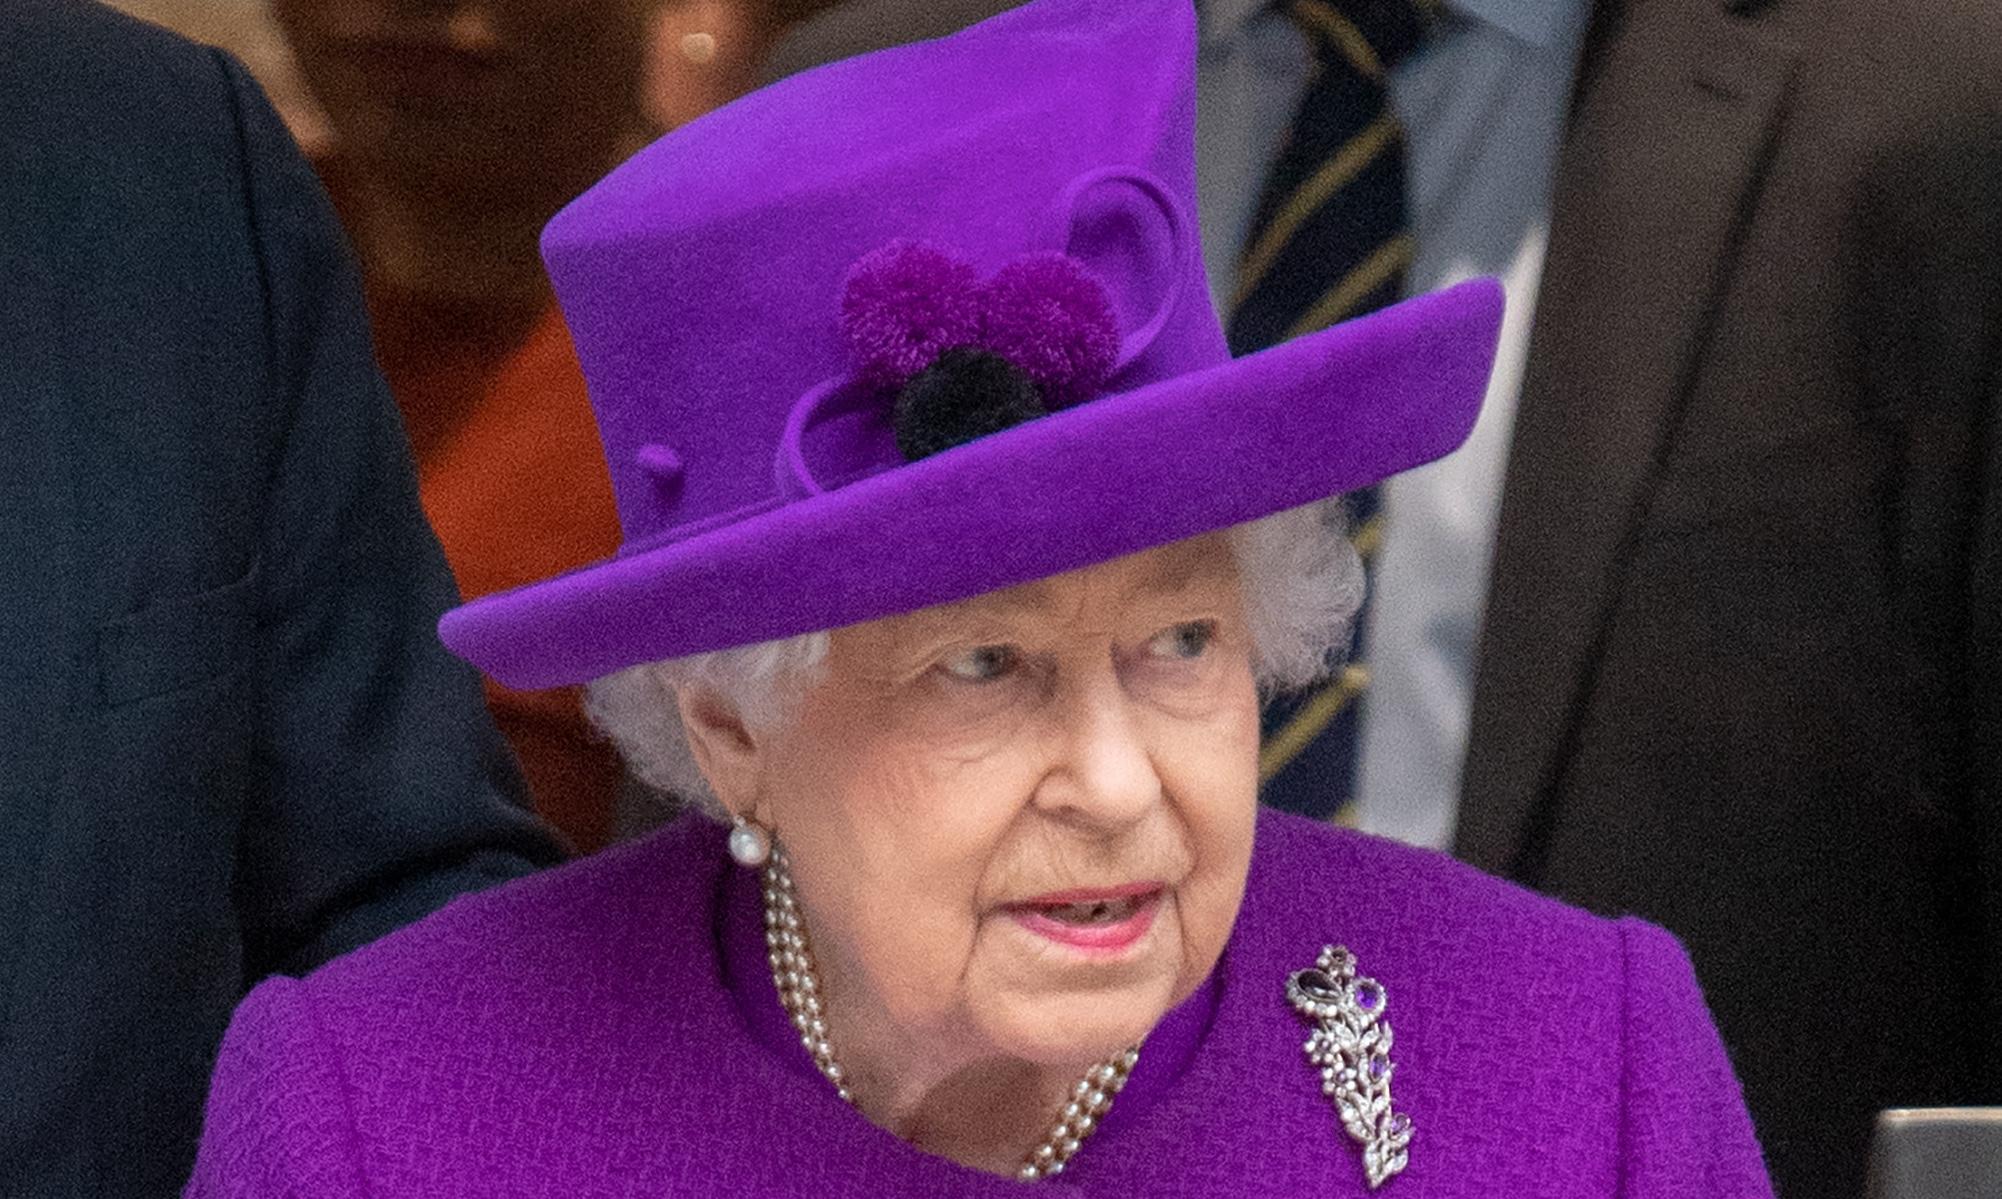 Coronavirus: Where are the Royal family self-isolating?